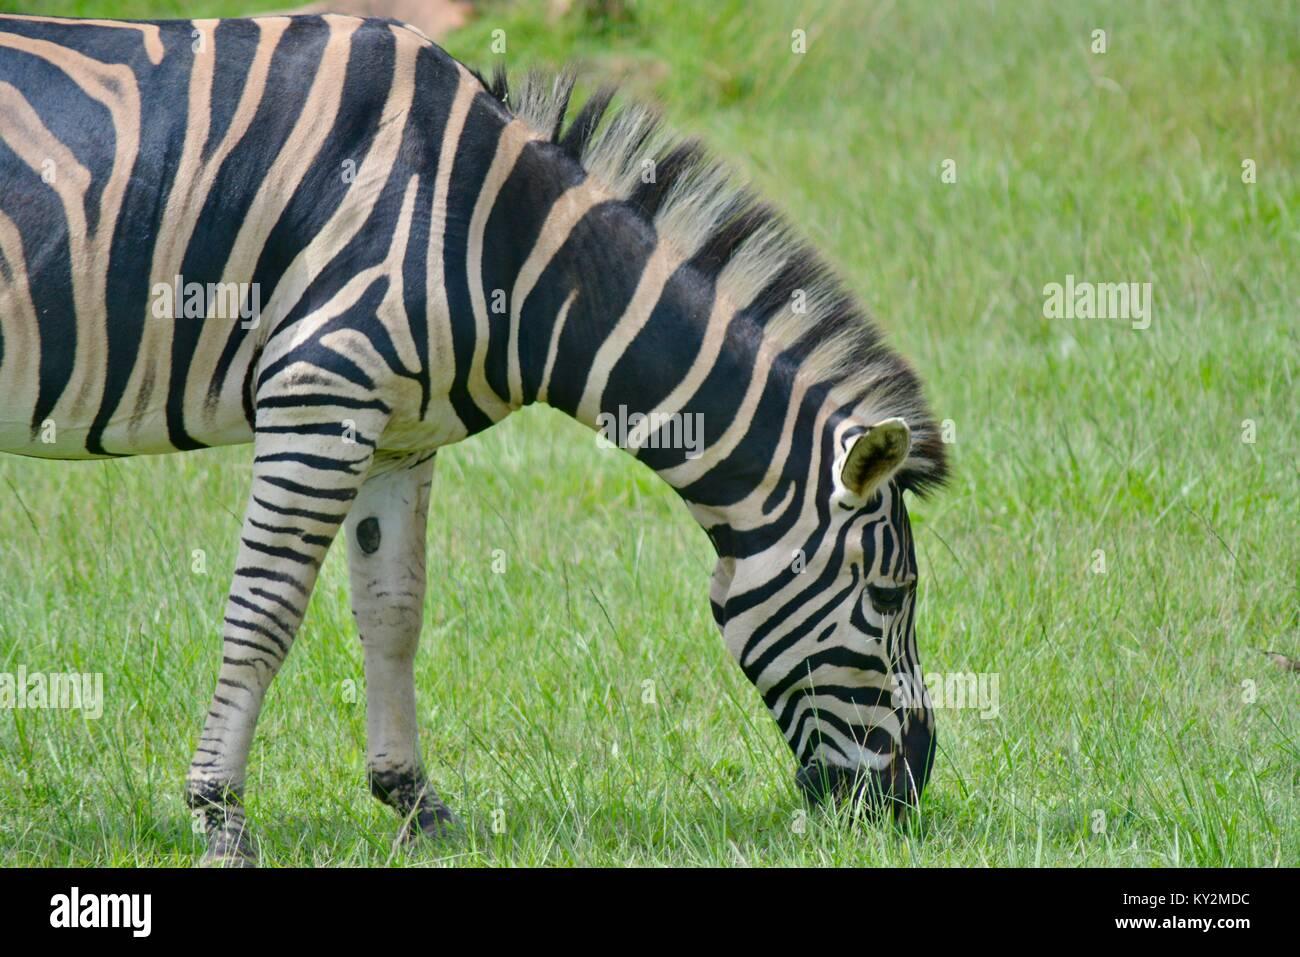 Zebra, Equus quagga, grazing Australia Zoo, Beerwah, Queensland, Australia - Stock Image